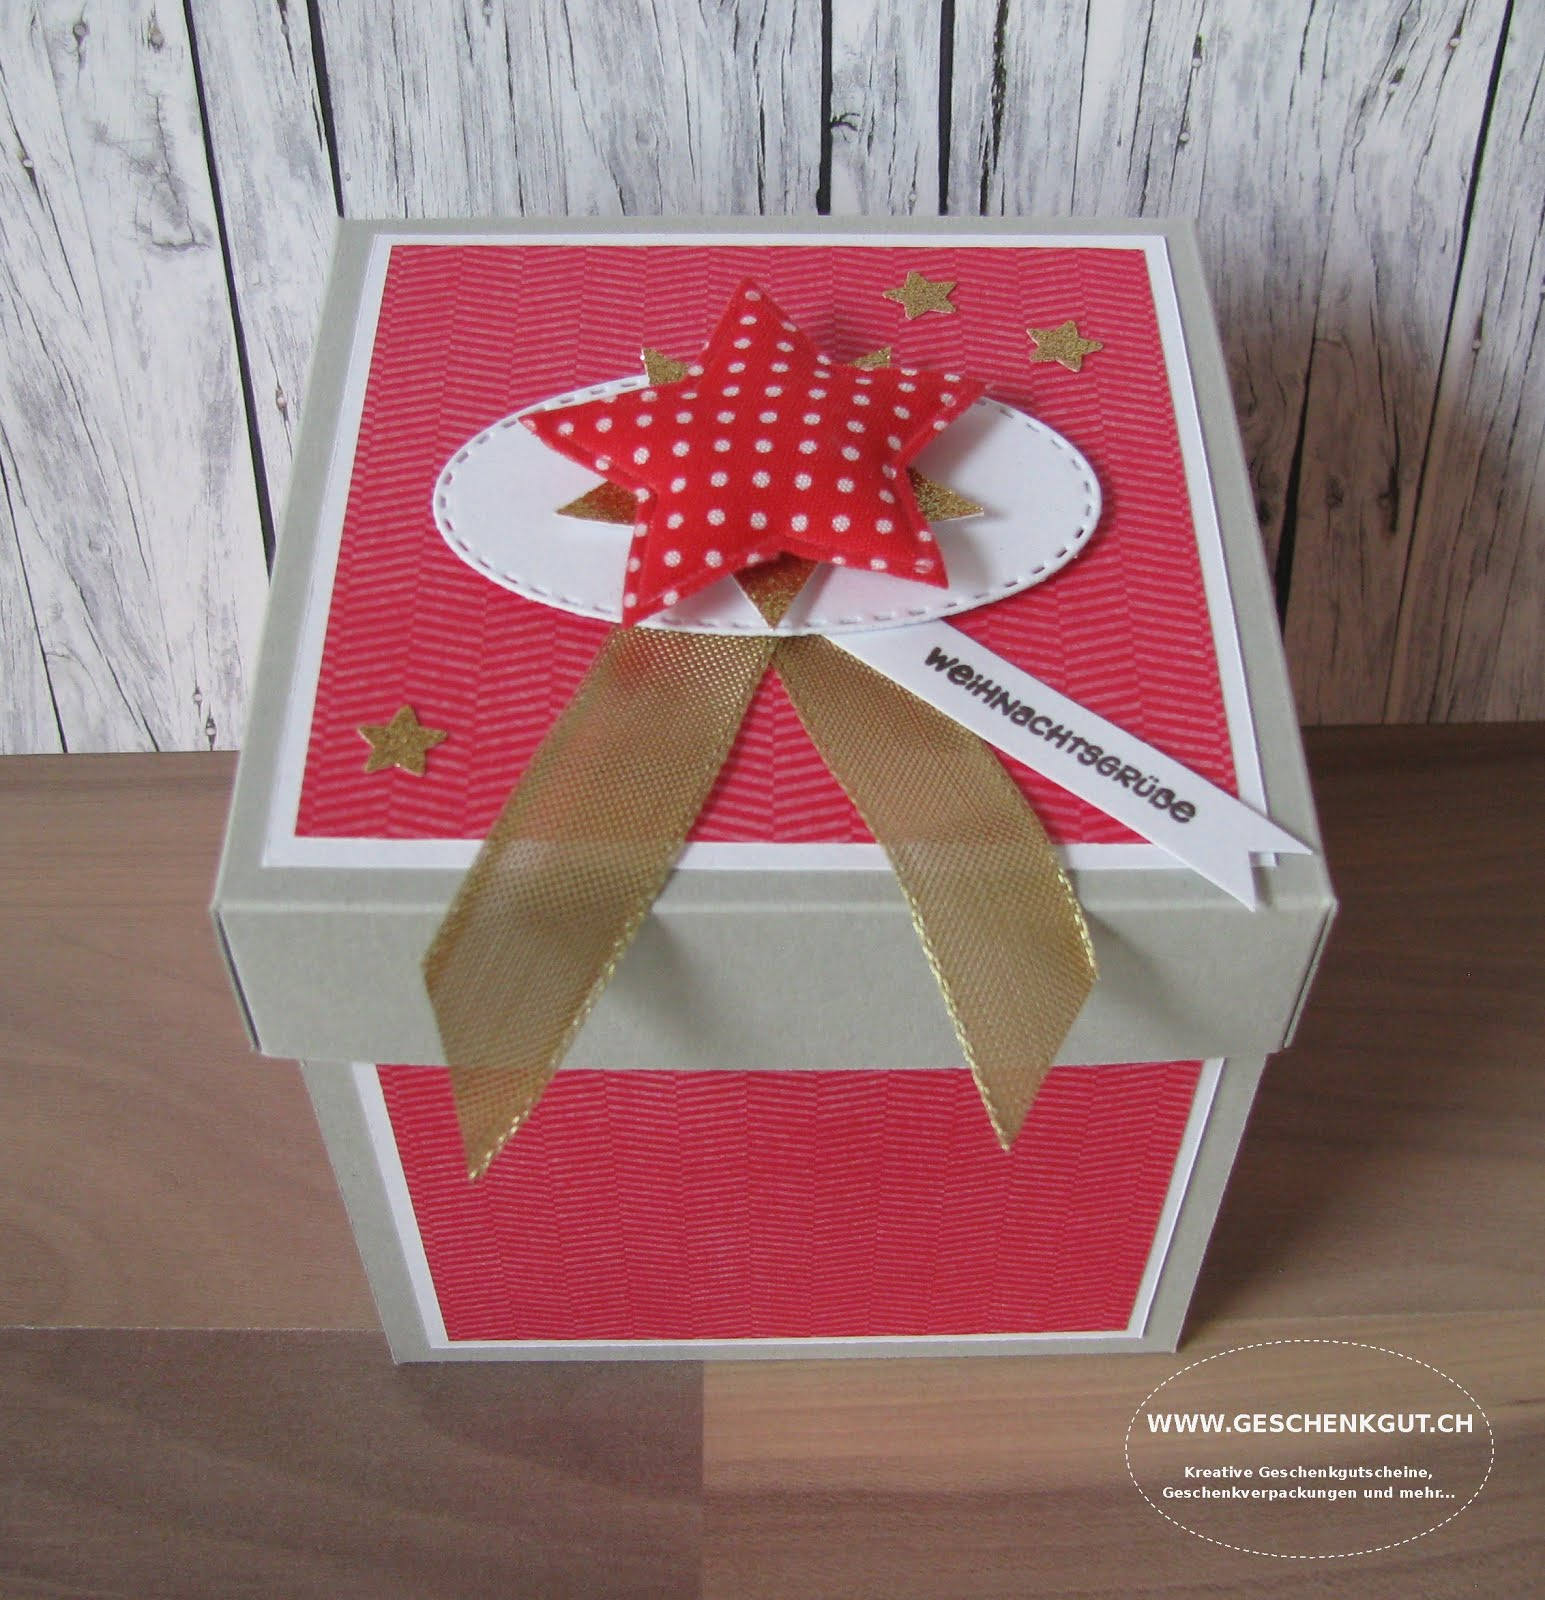 GESCHENKGUT: Shop - Geschenkverpackungen, Geschenkgutscheine ...